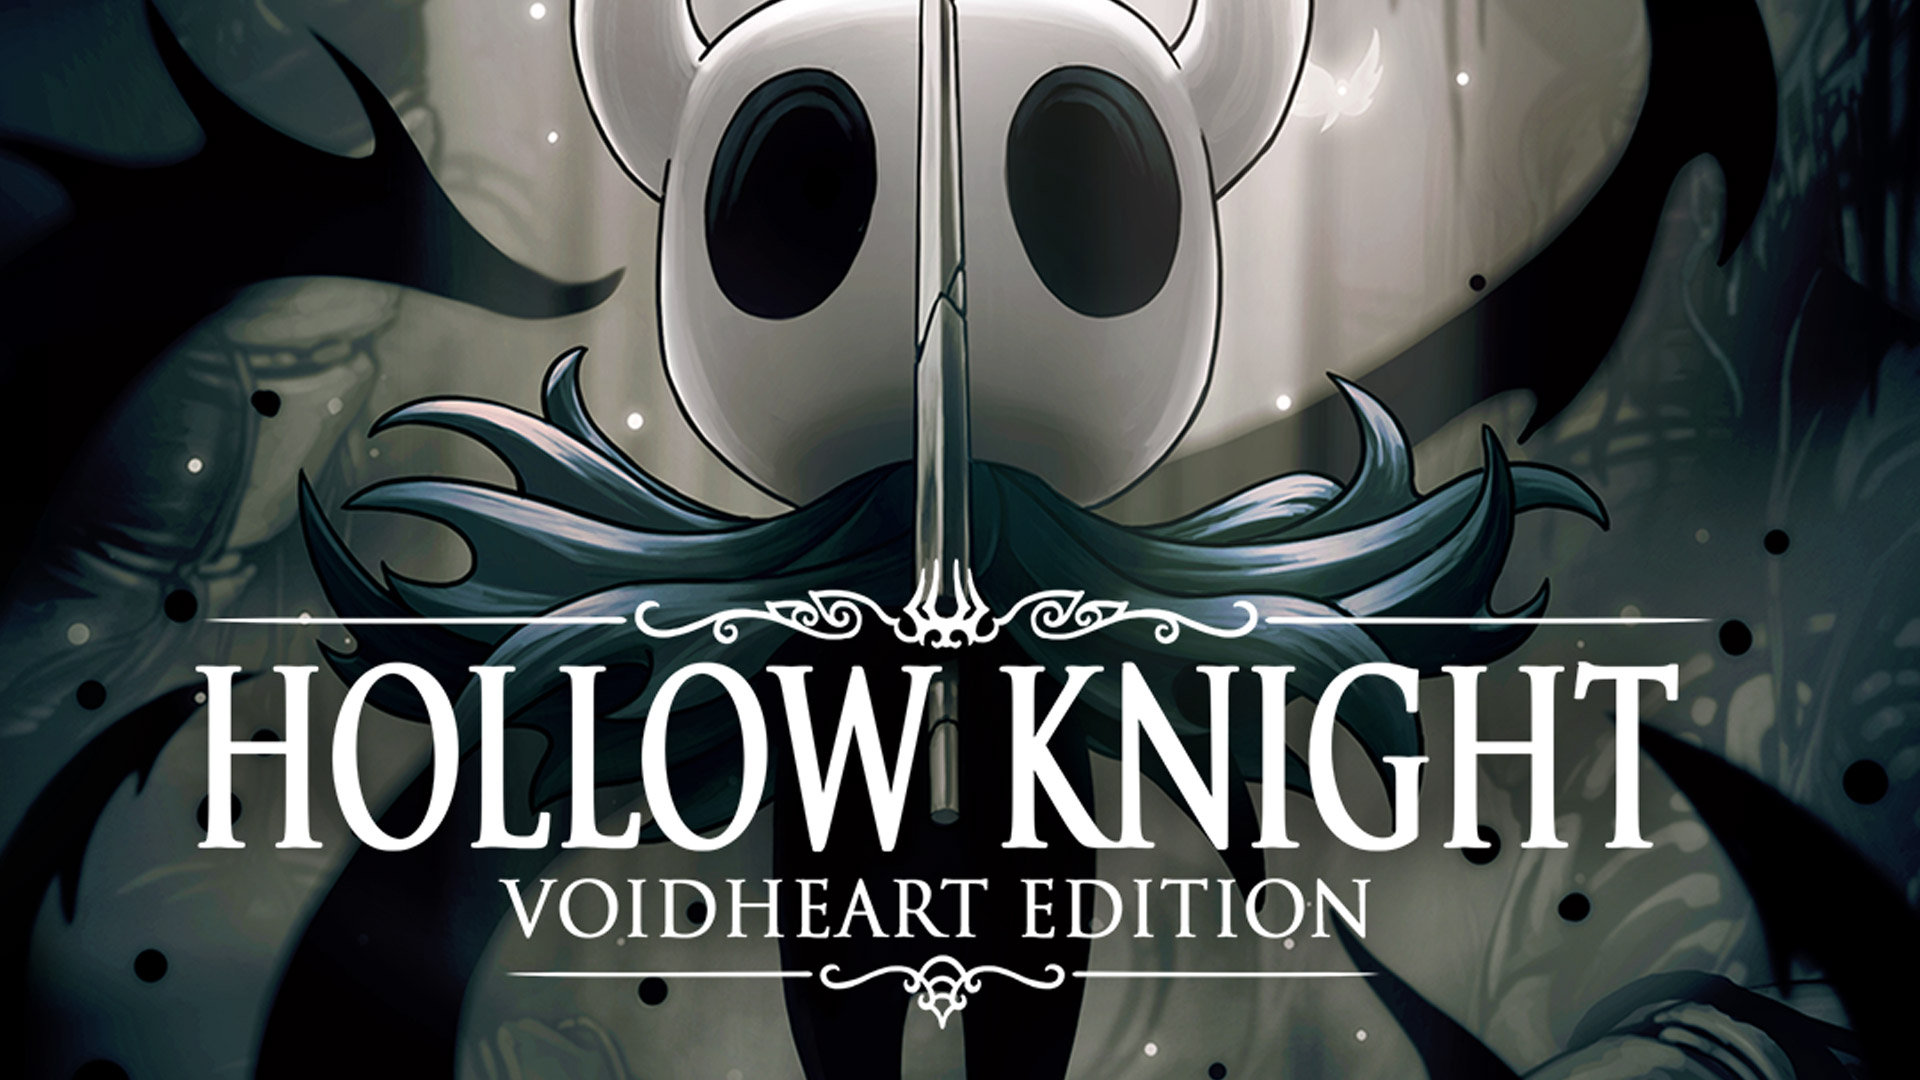 Free Hollow Knight Wallpaper in 1920x1080